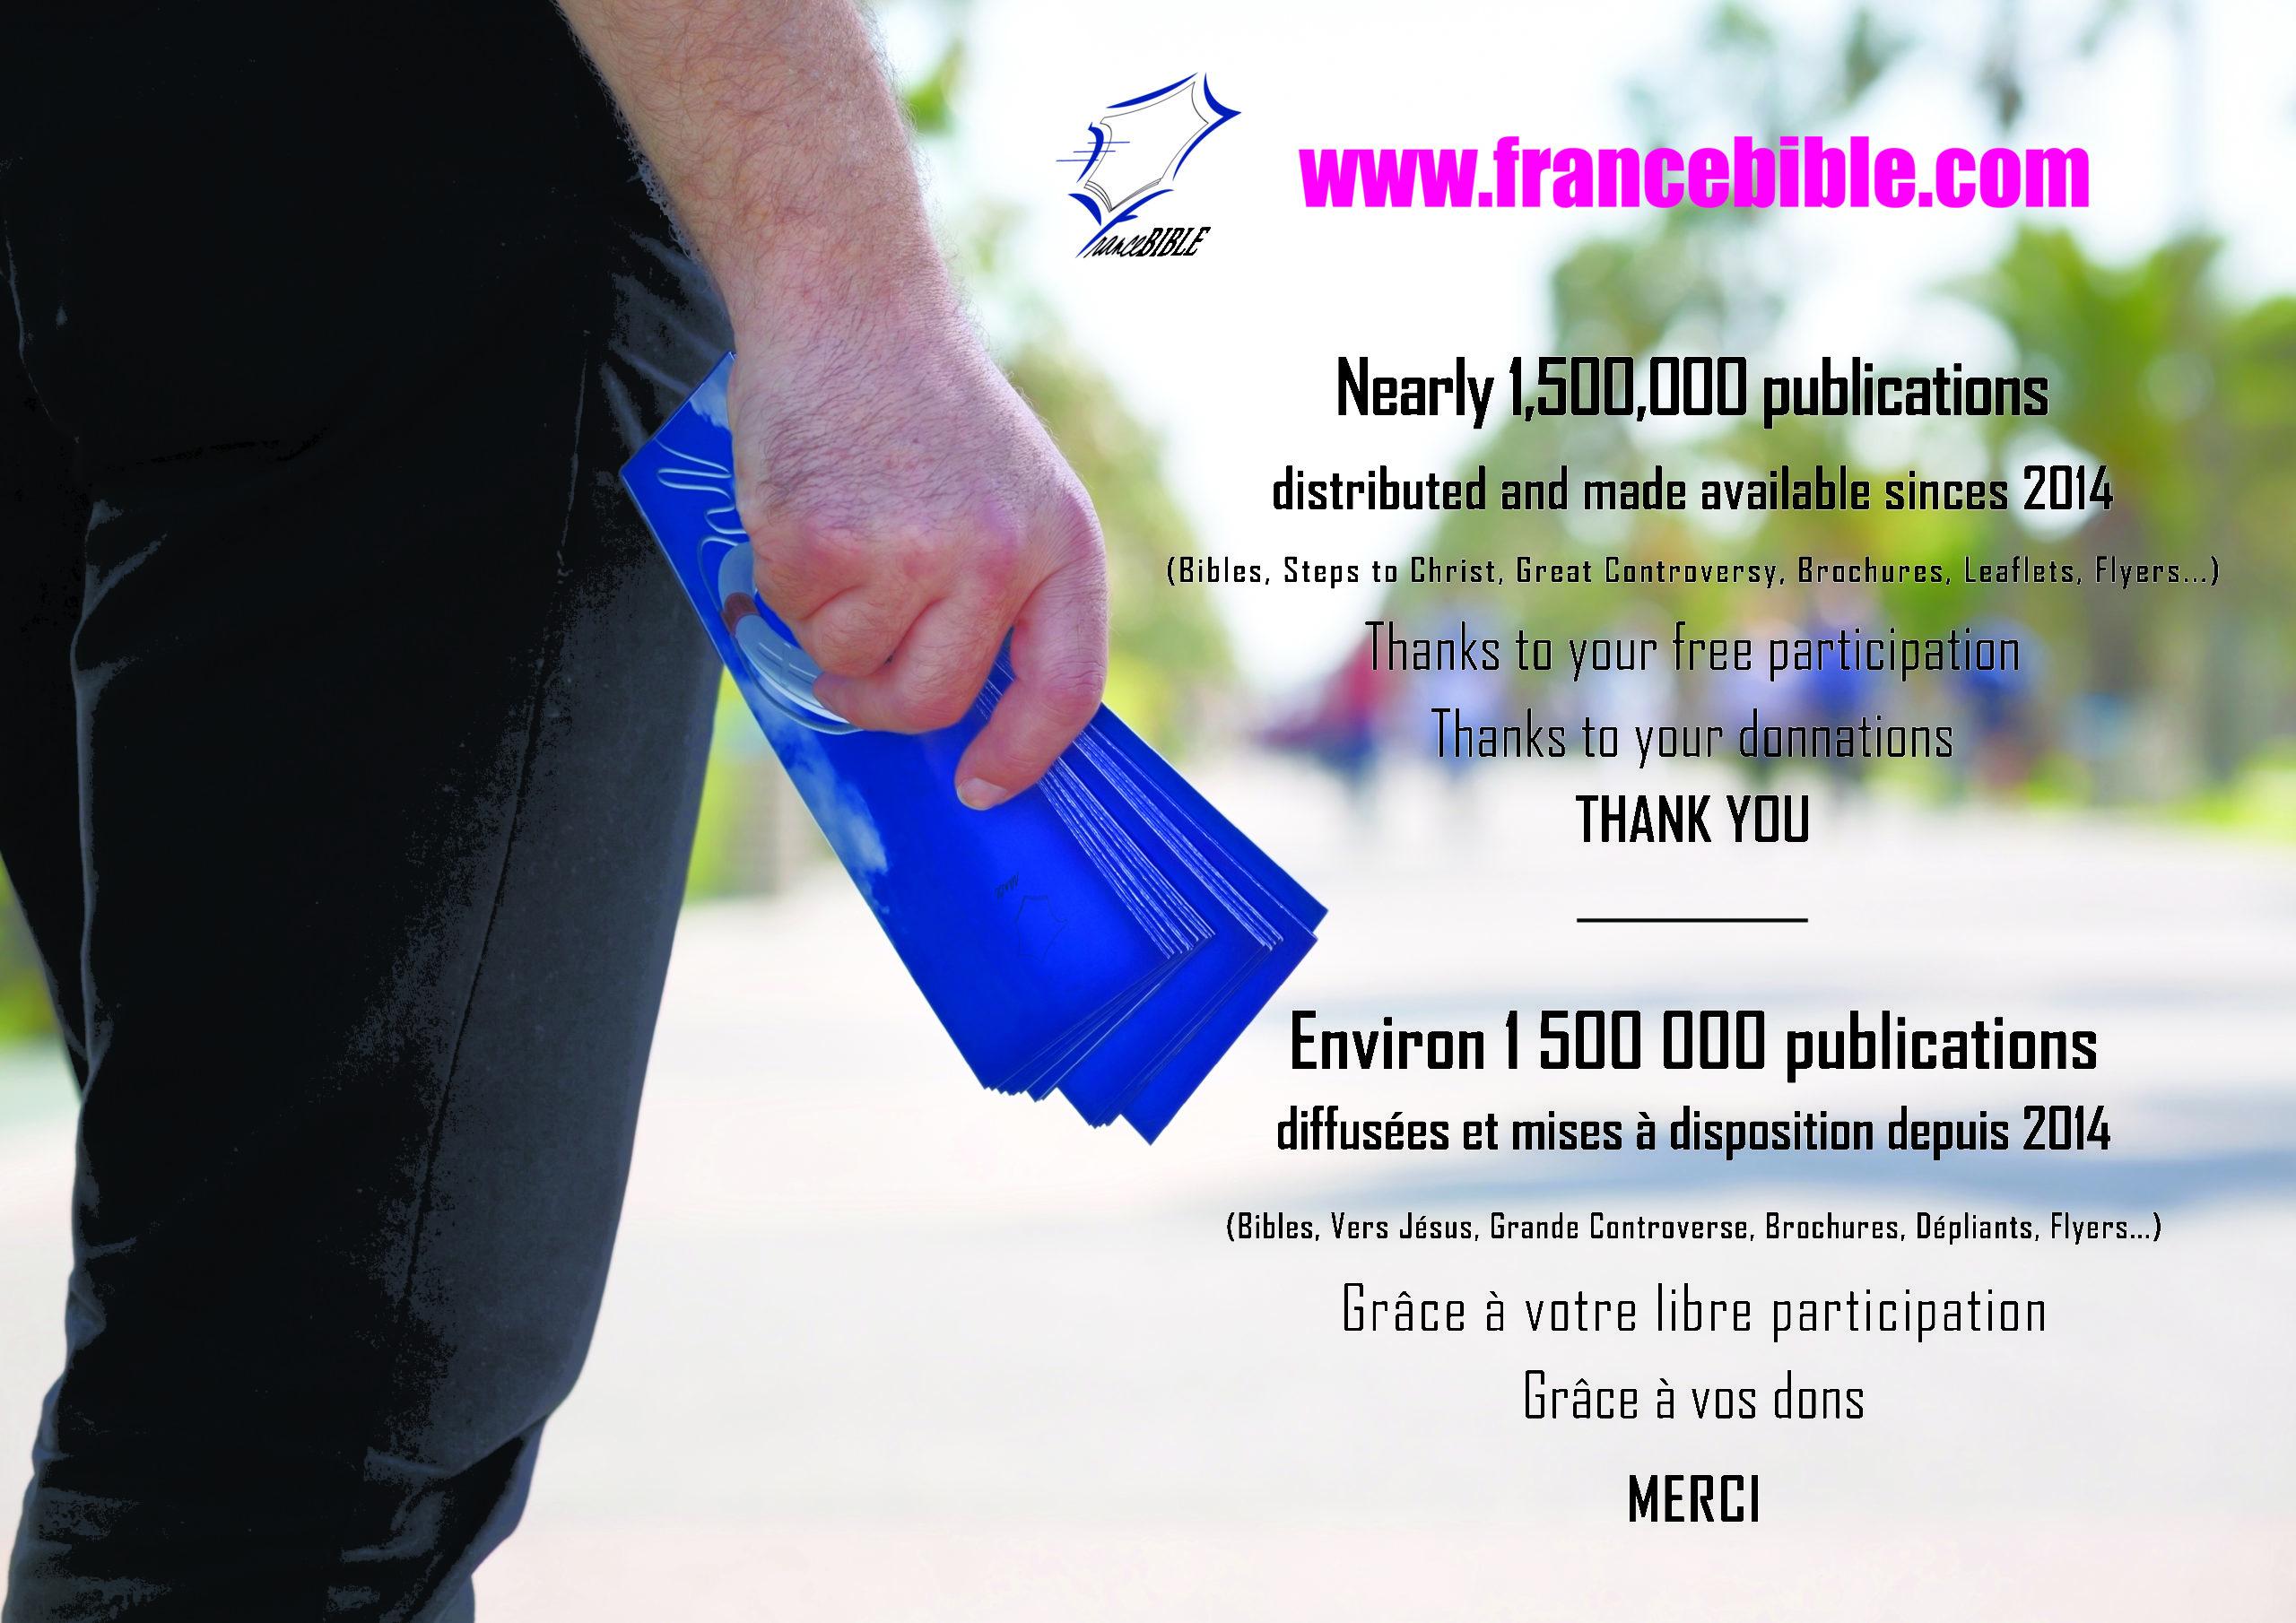 FranceBIBLE